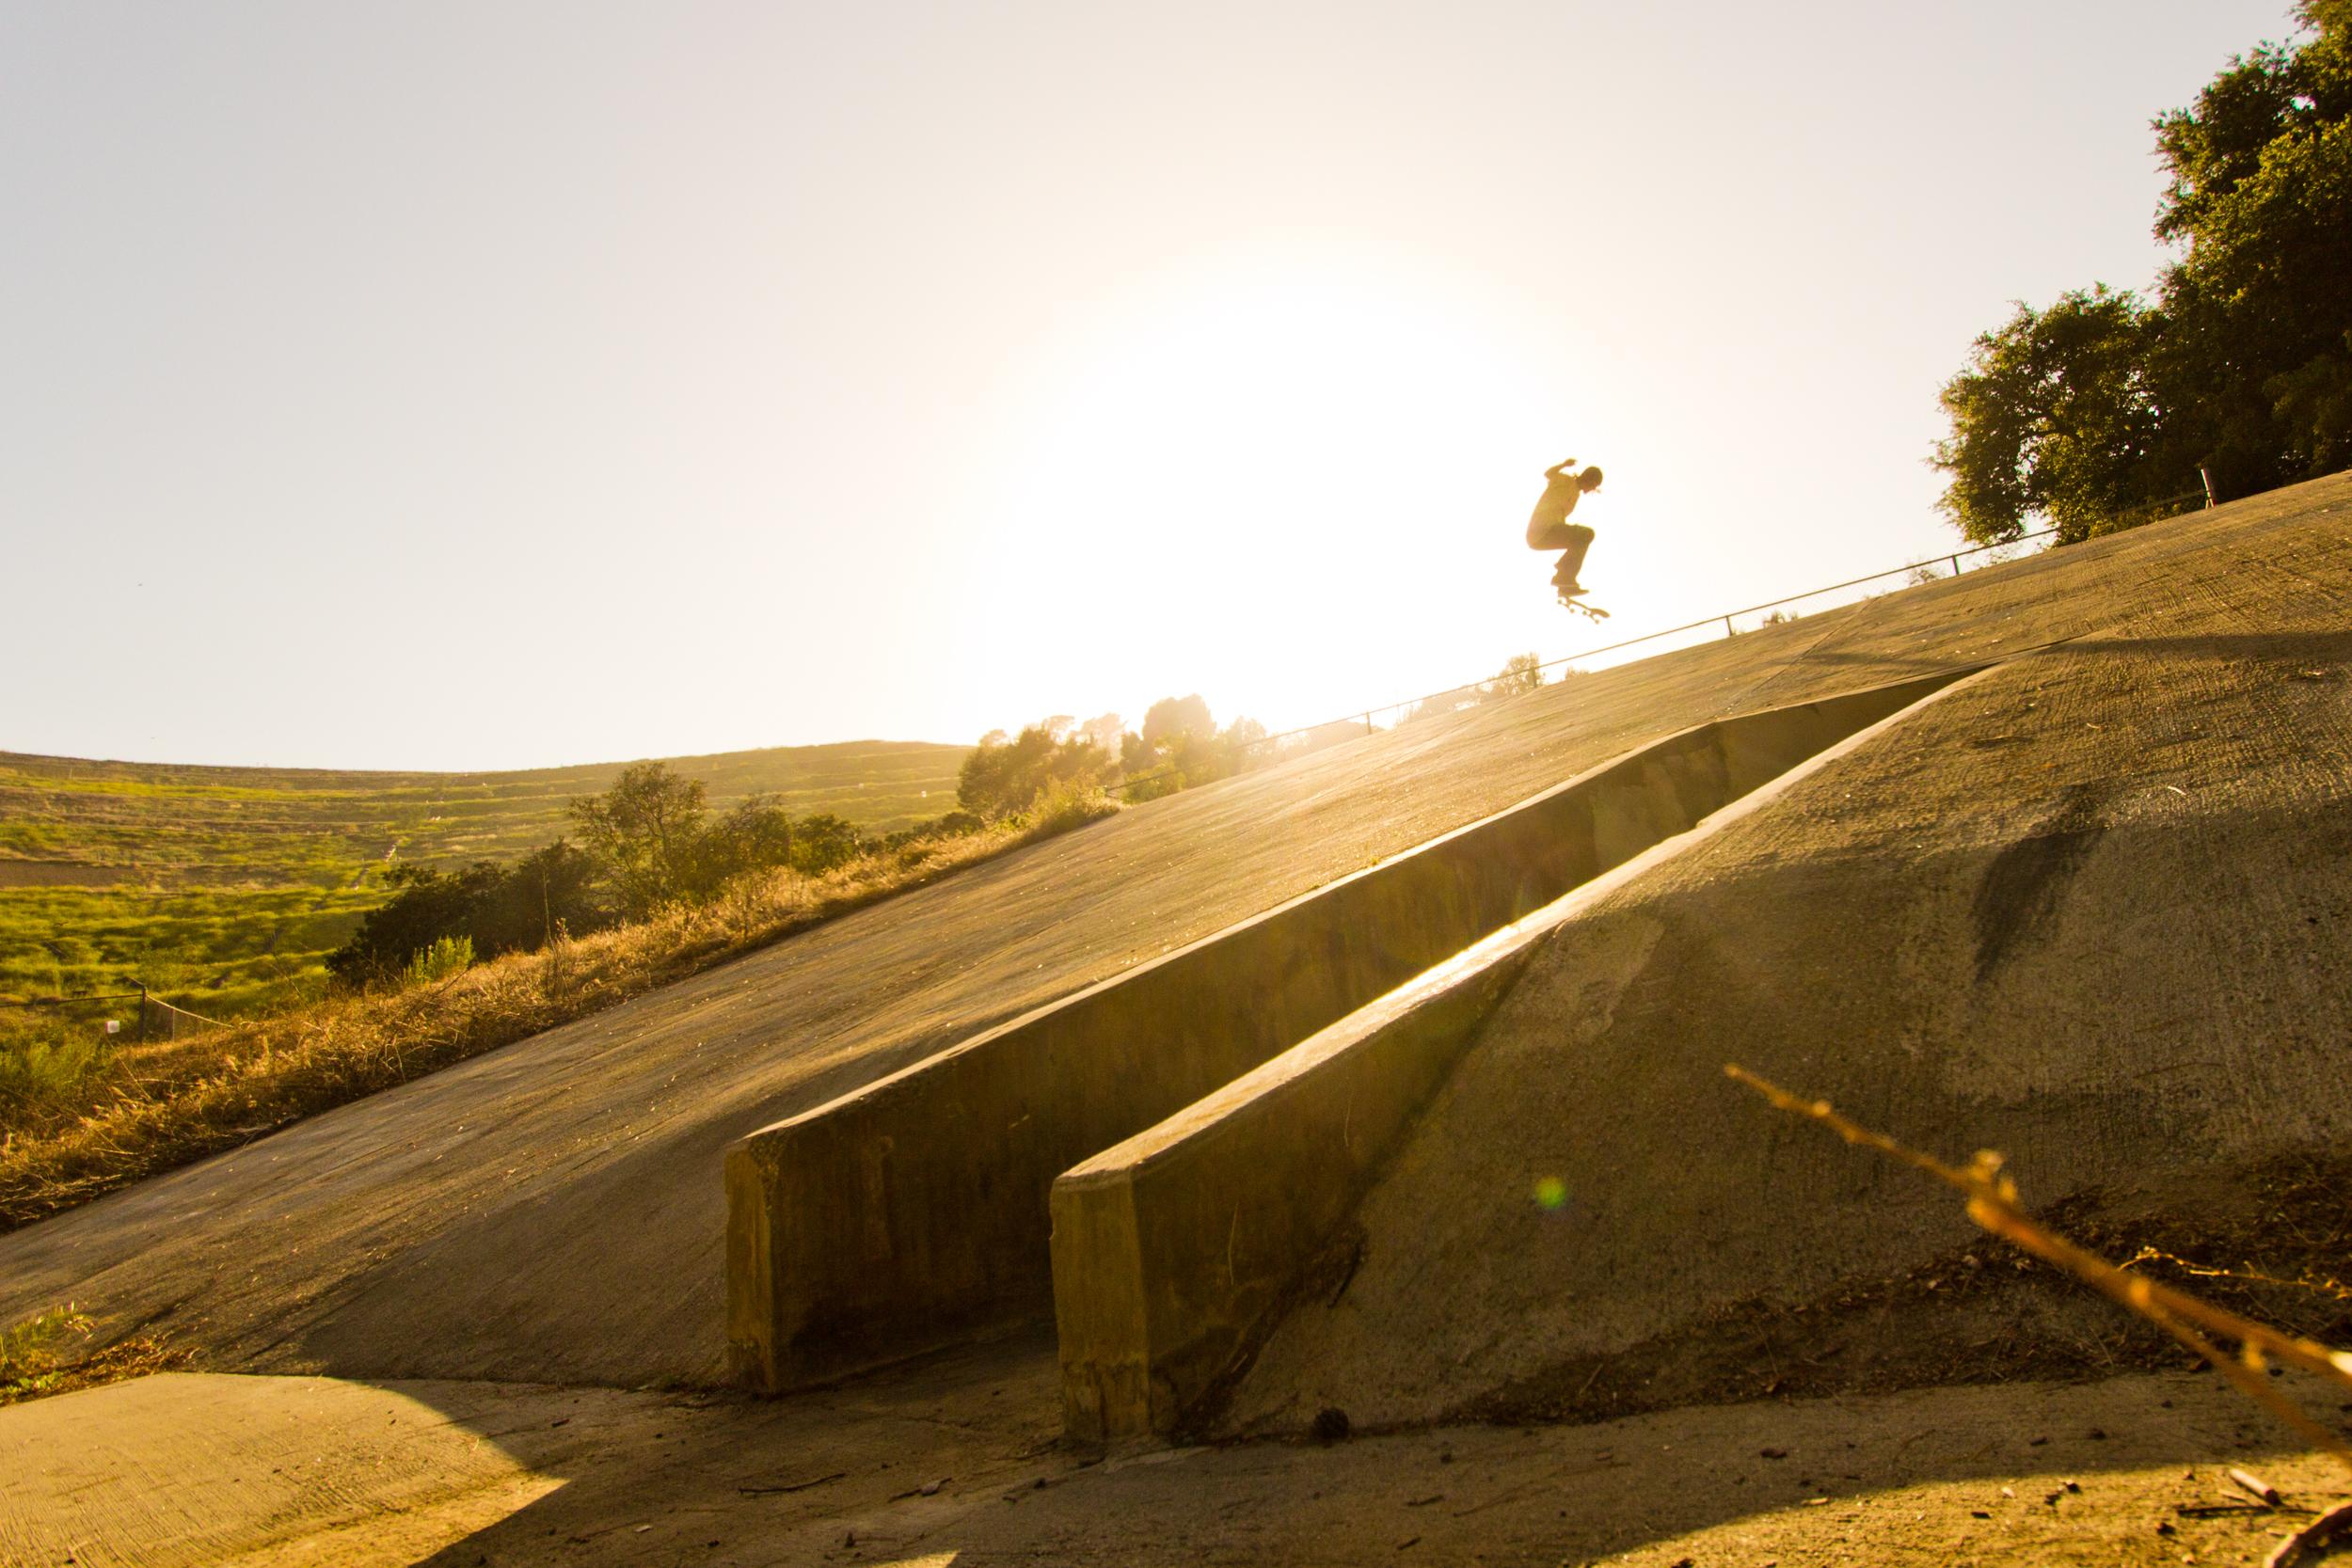 Kev - Fakie Flip, Griffith Park CA